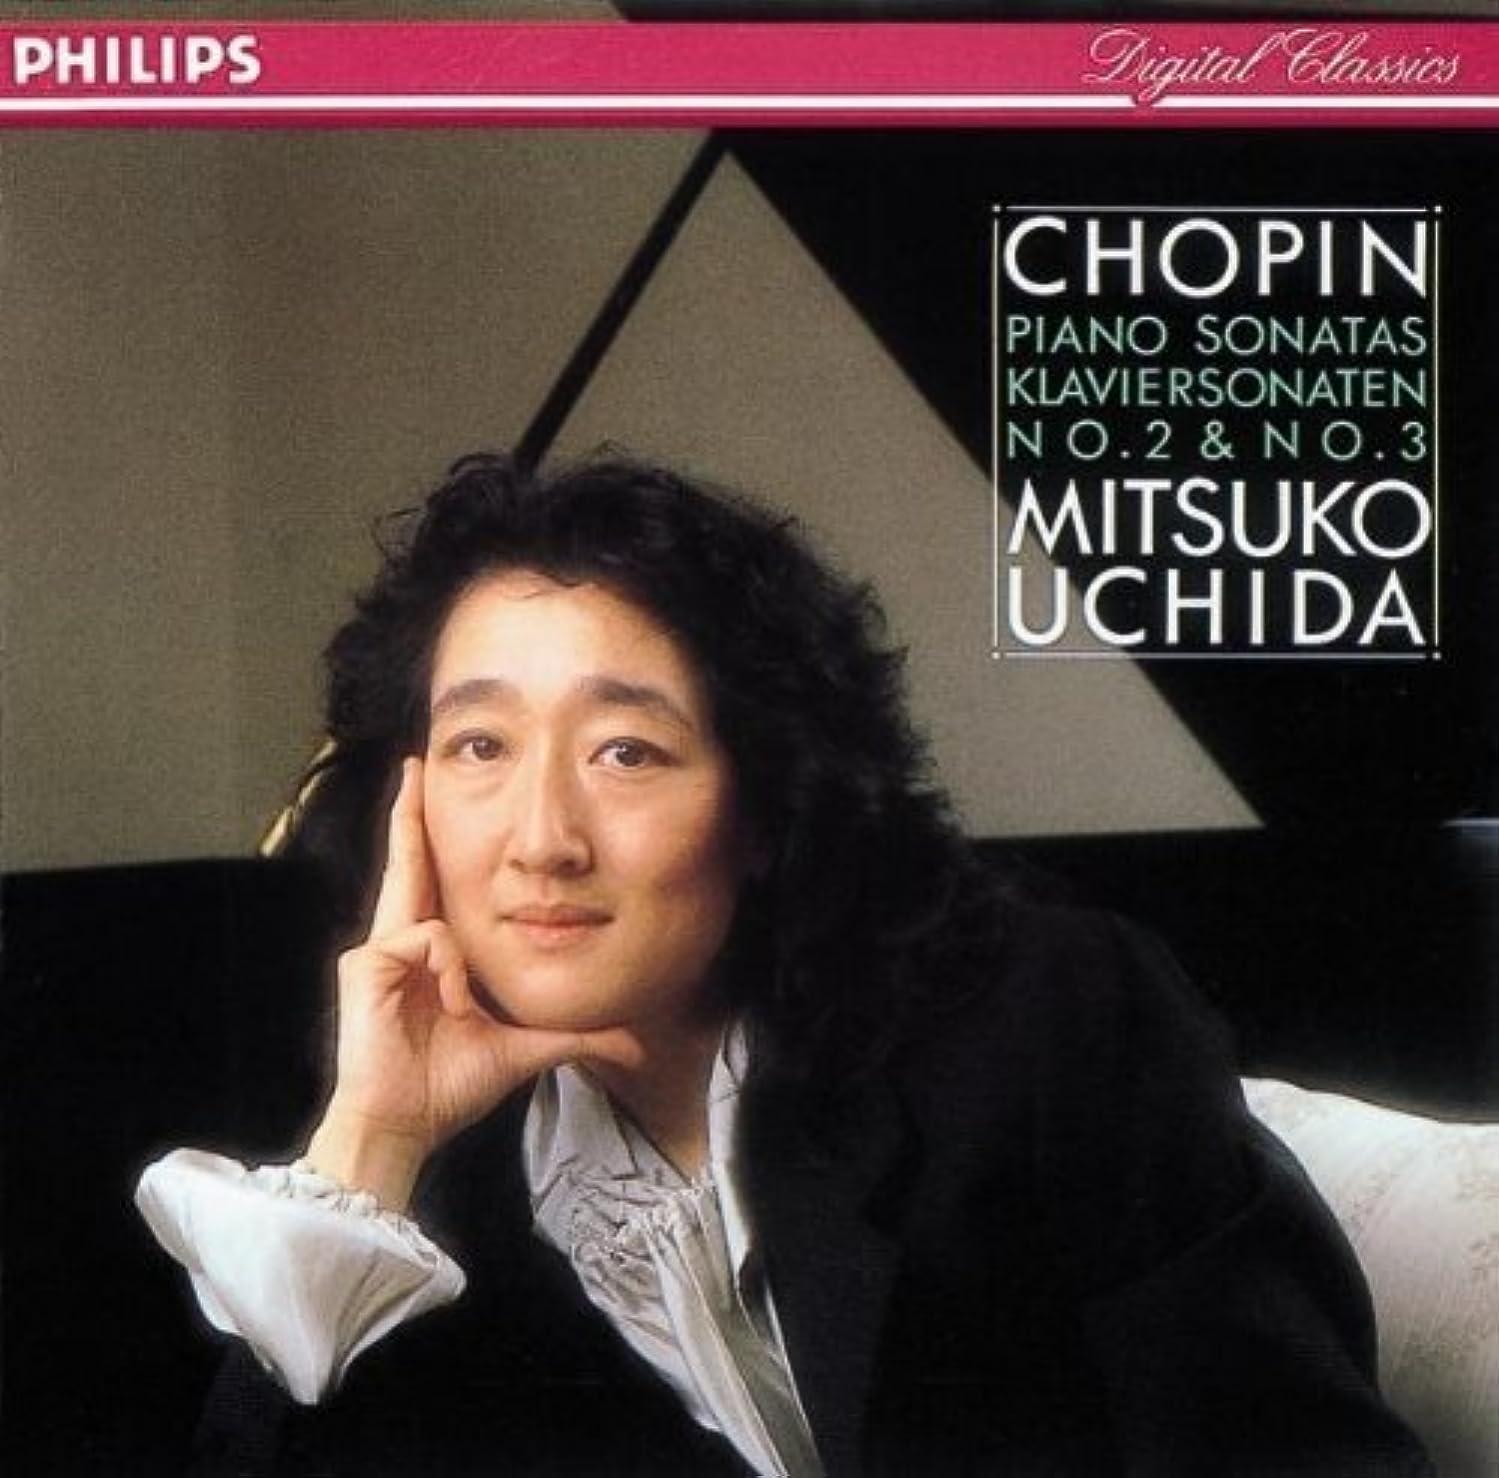 Chopin:Piano Sonatas 2 & 3 By Frederic Chopin (Composer),,Mitsuko Uchida (Performer) (1989-03-28)